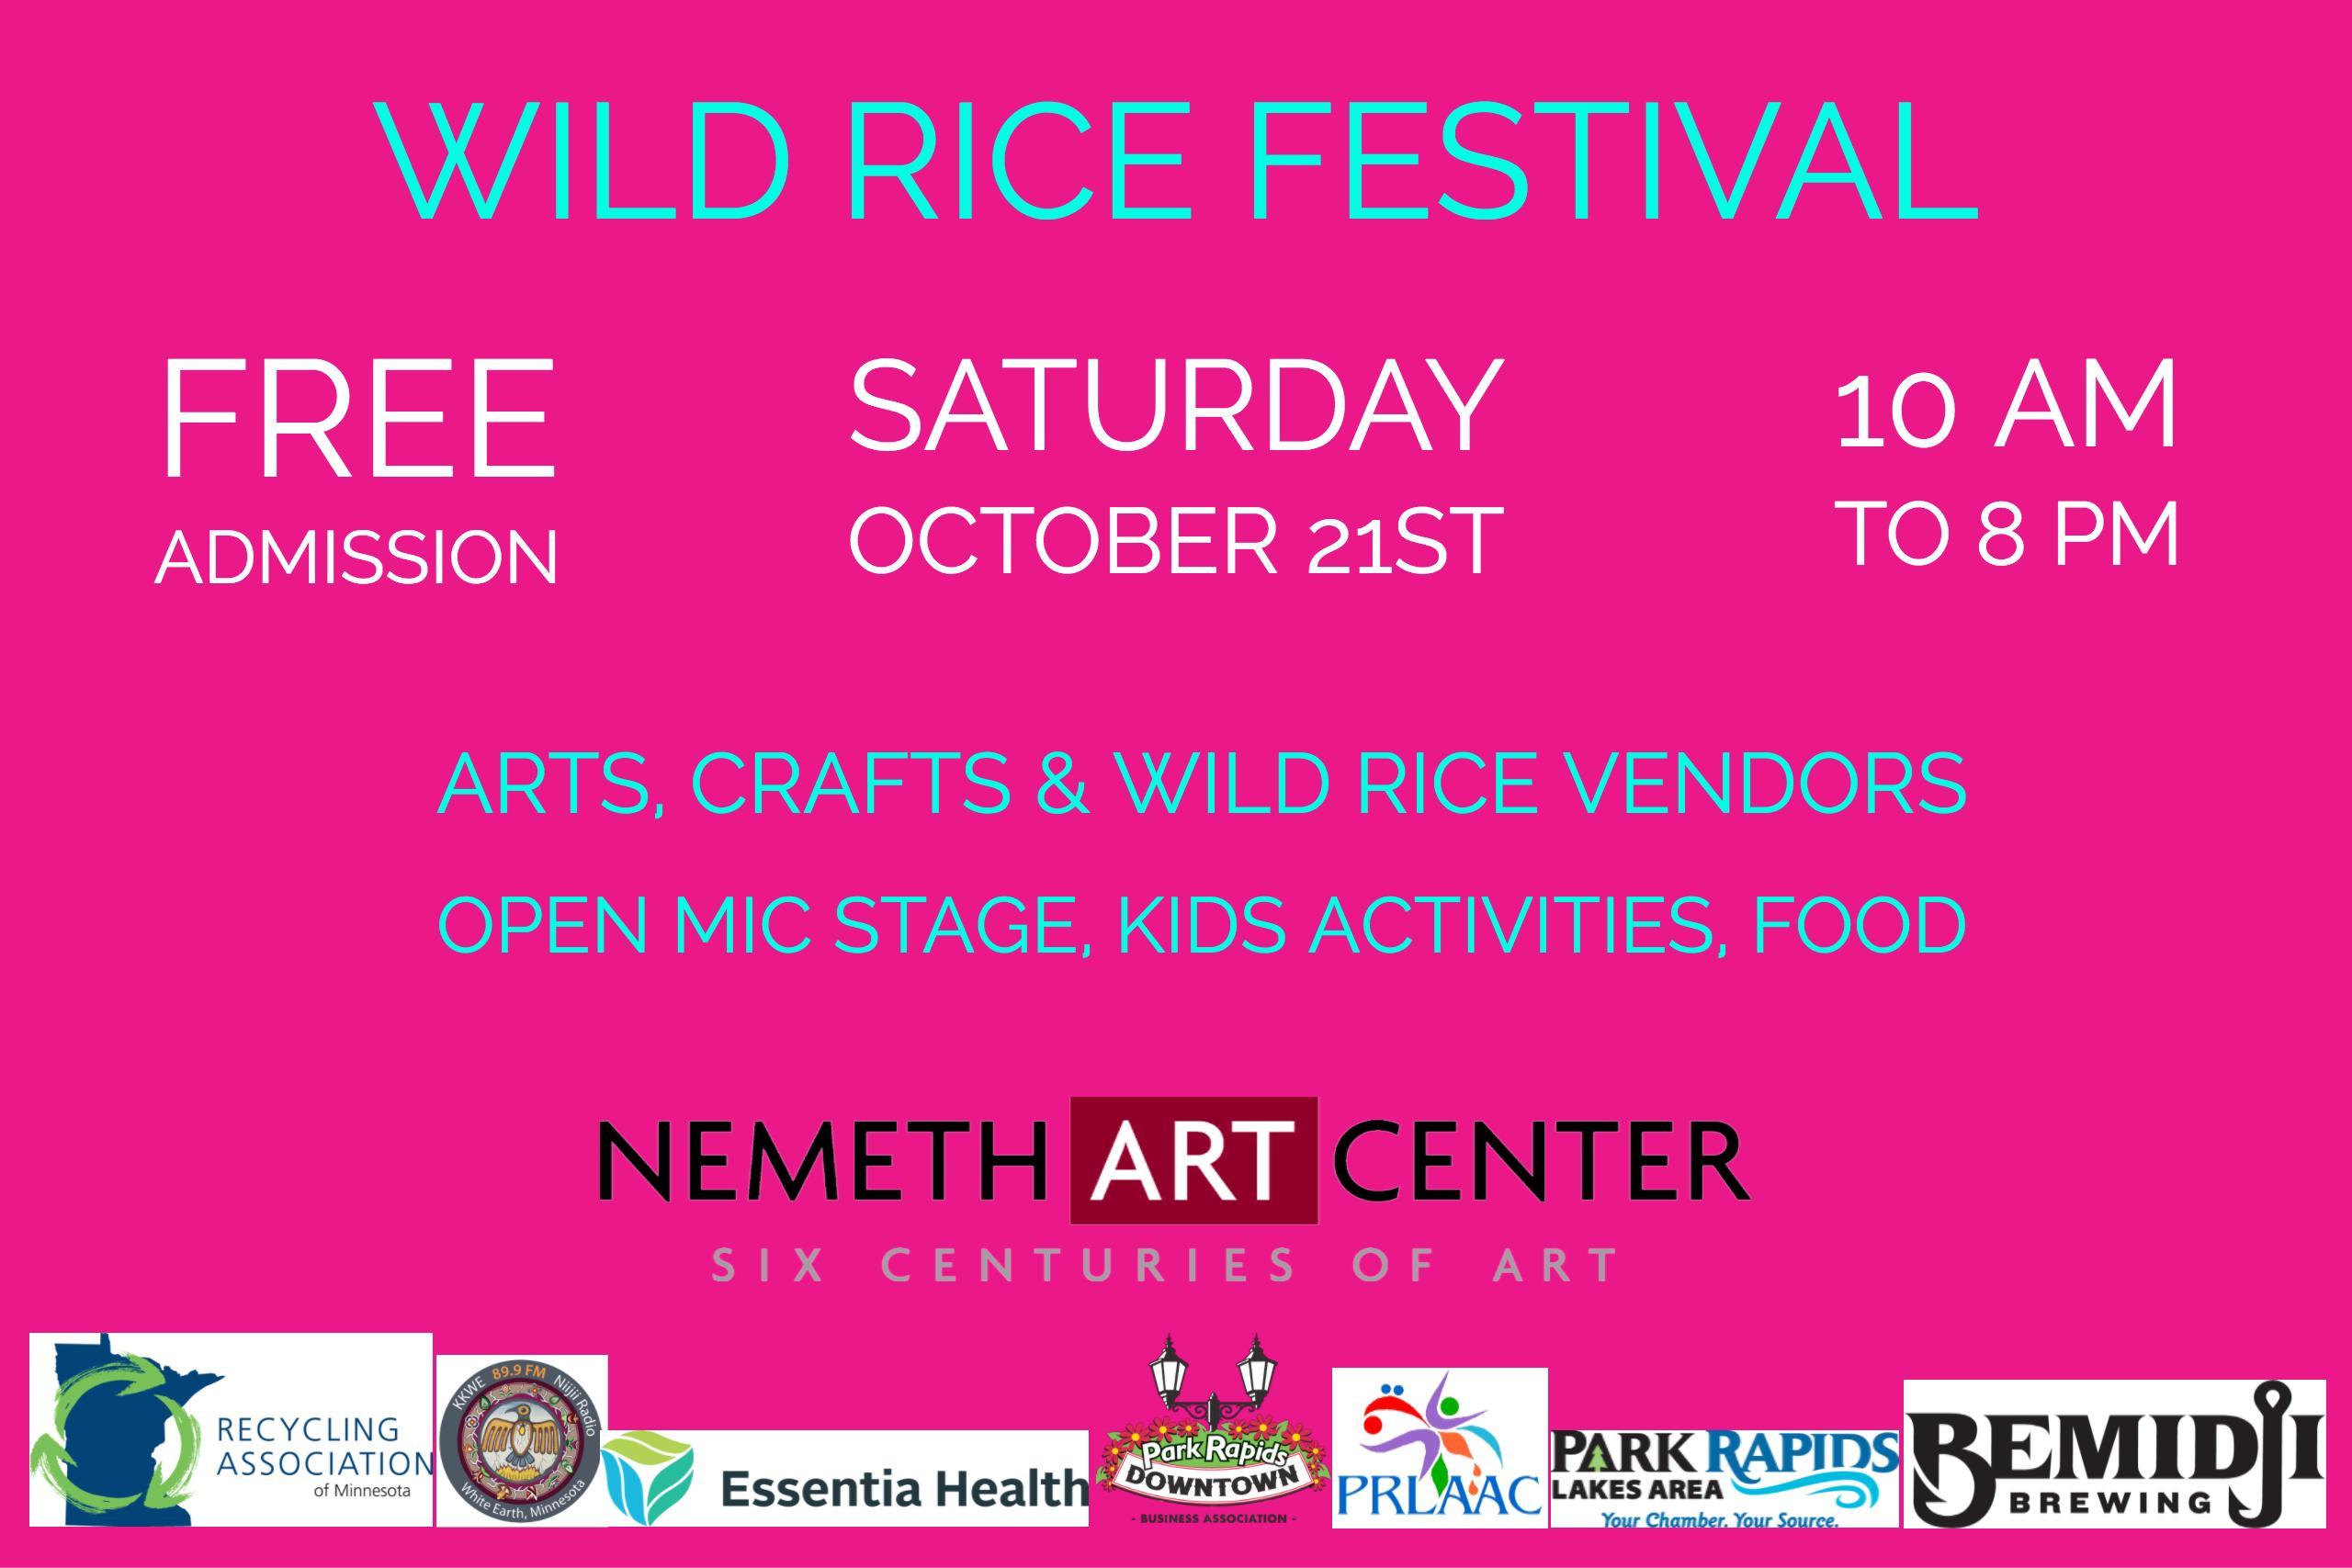 Wild Rice Festival 2017 - Free Admission, Saturday, Oct 21 - 10AM - 8 PM